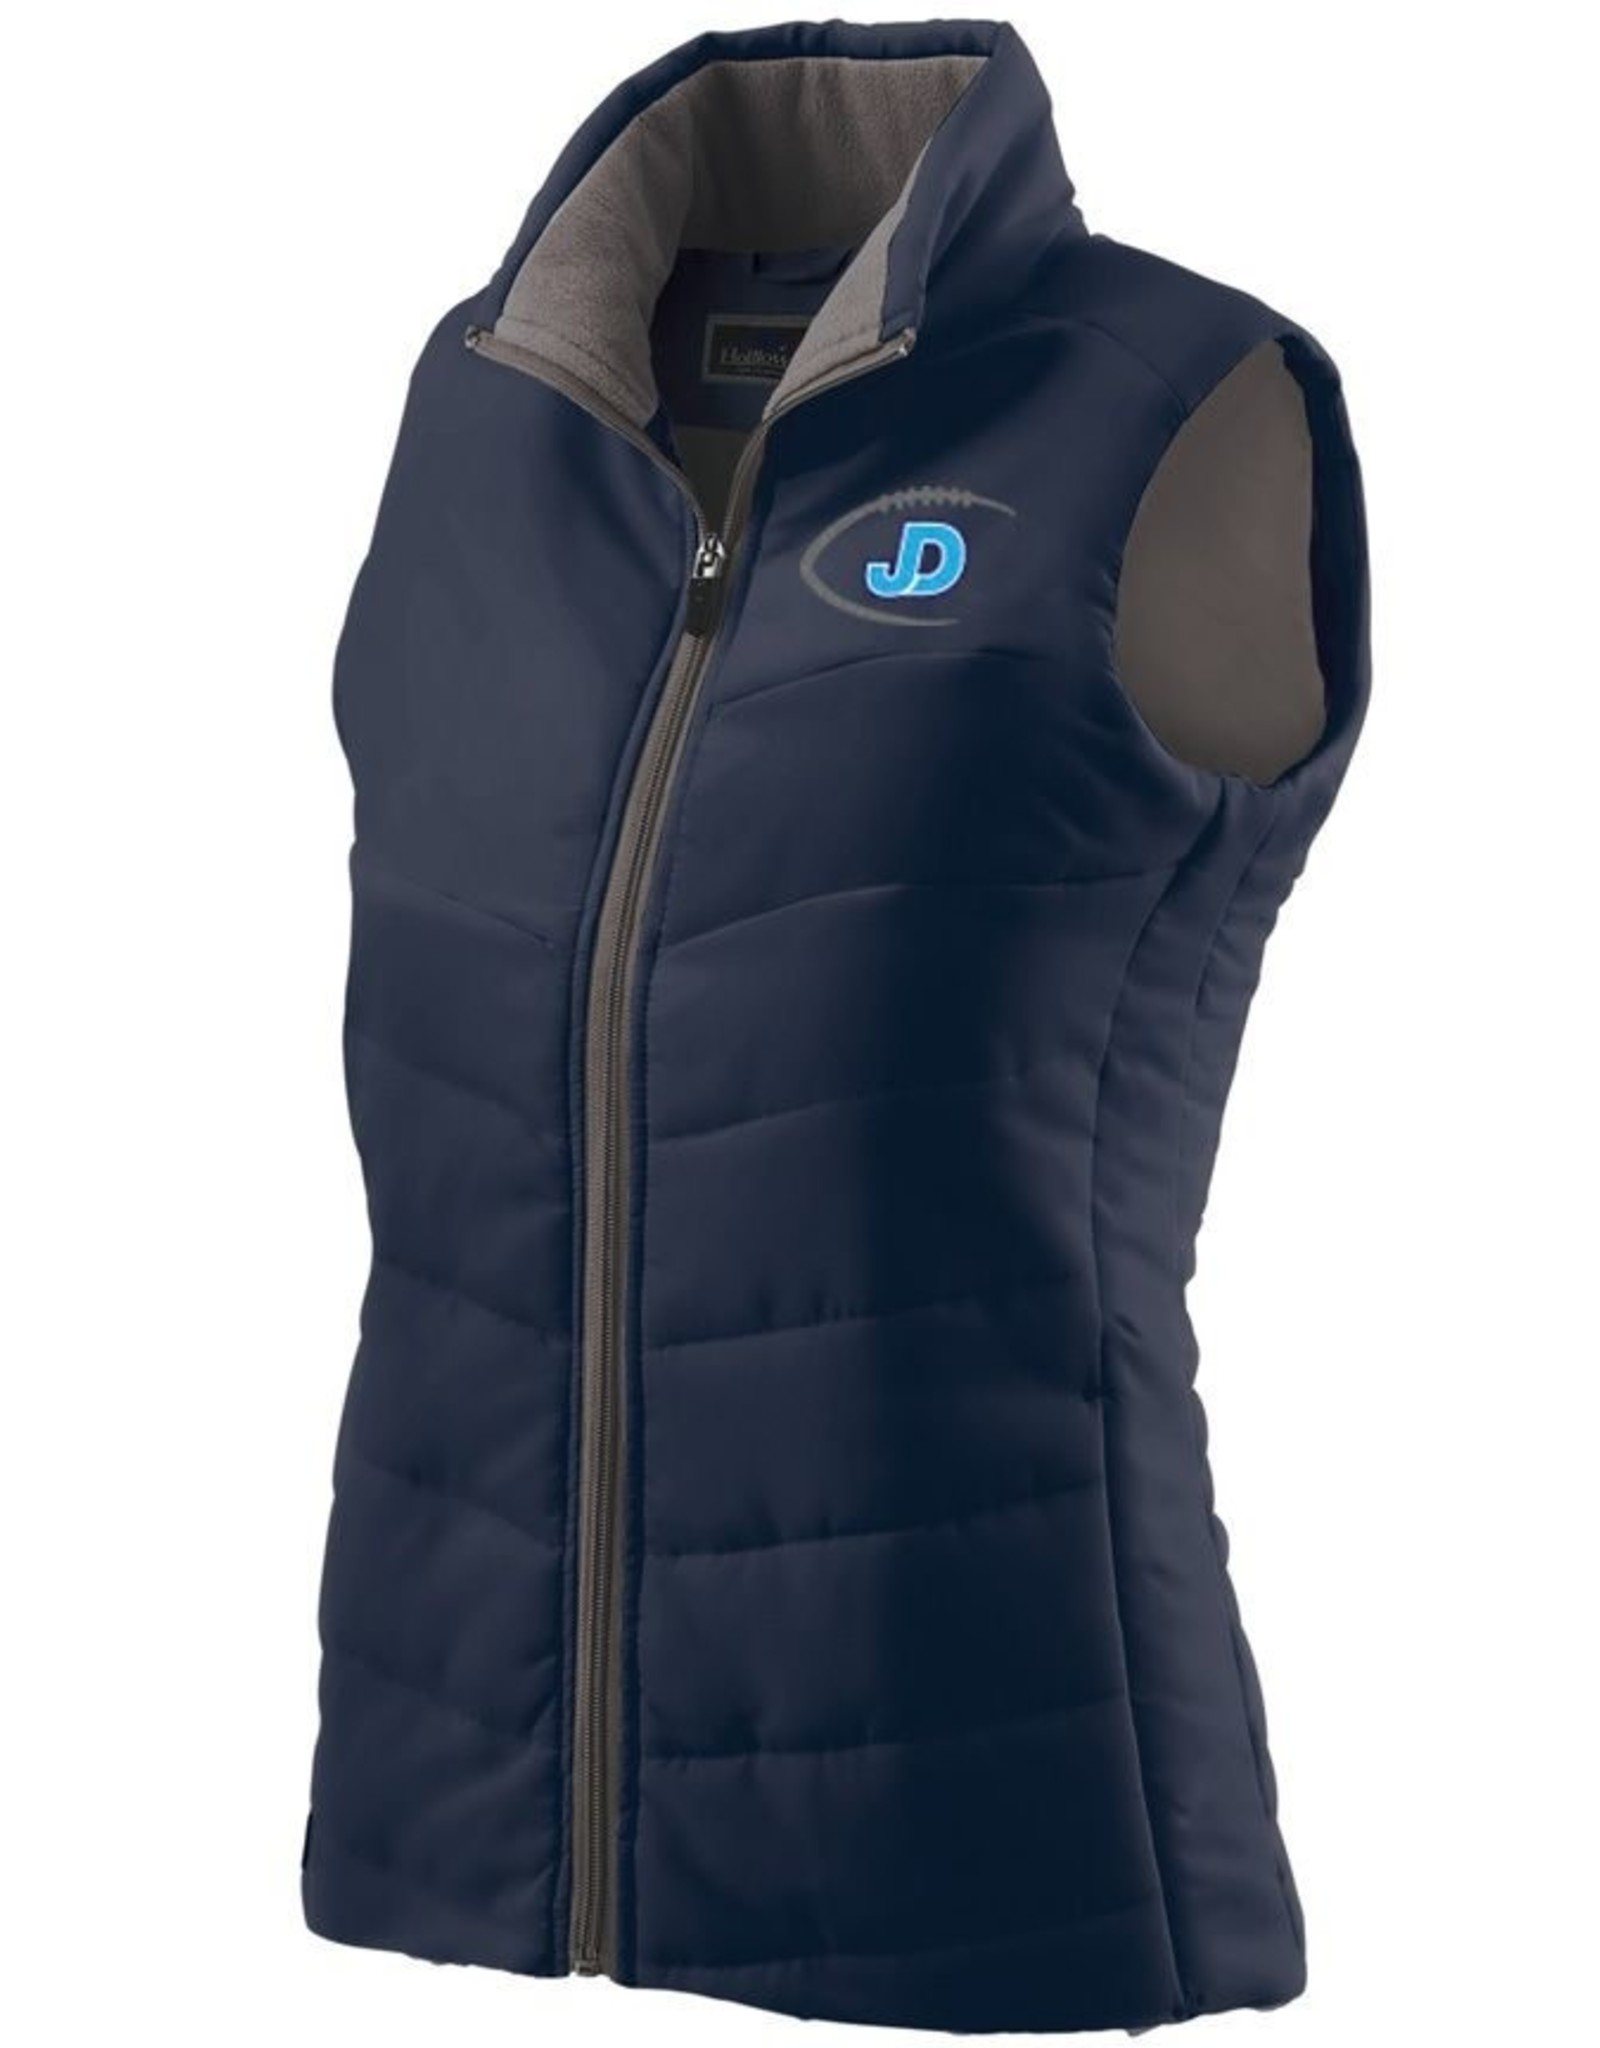 NON-UNIFORM JD Women's Football Navy Vest